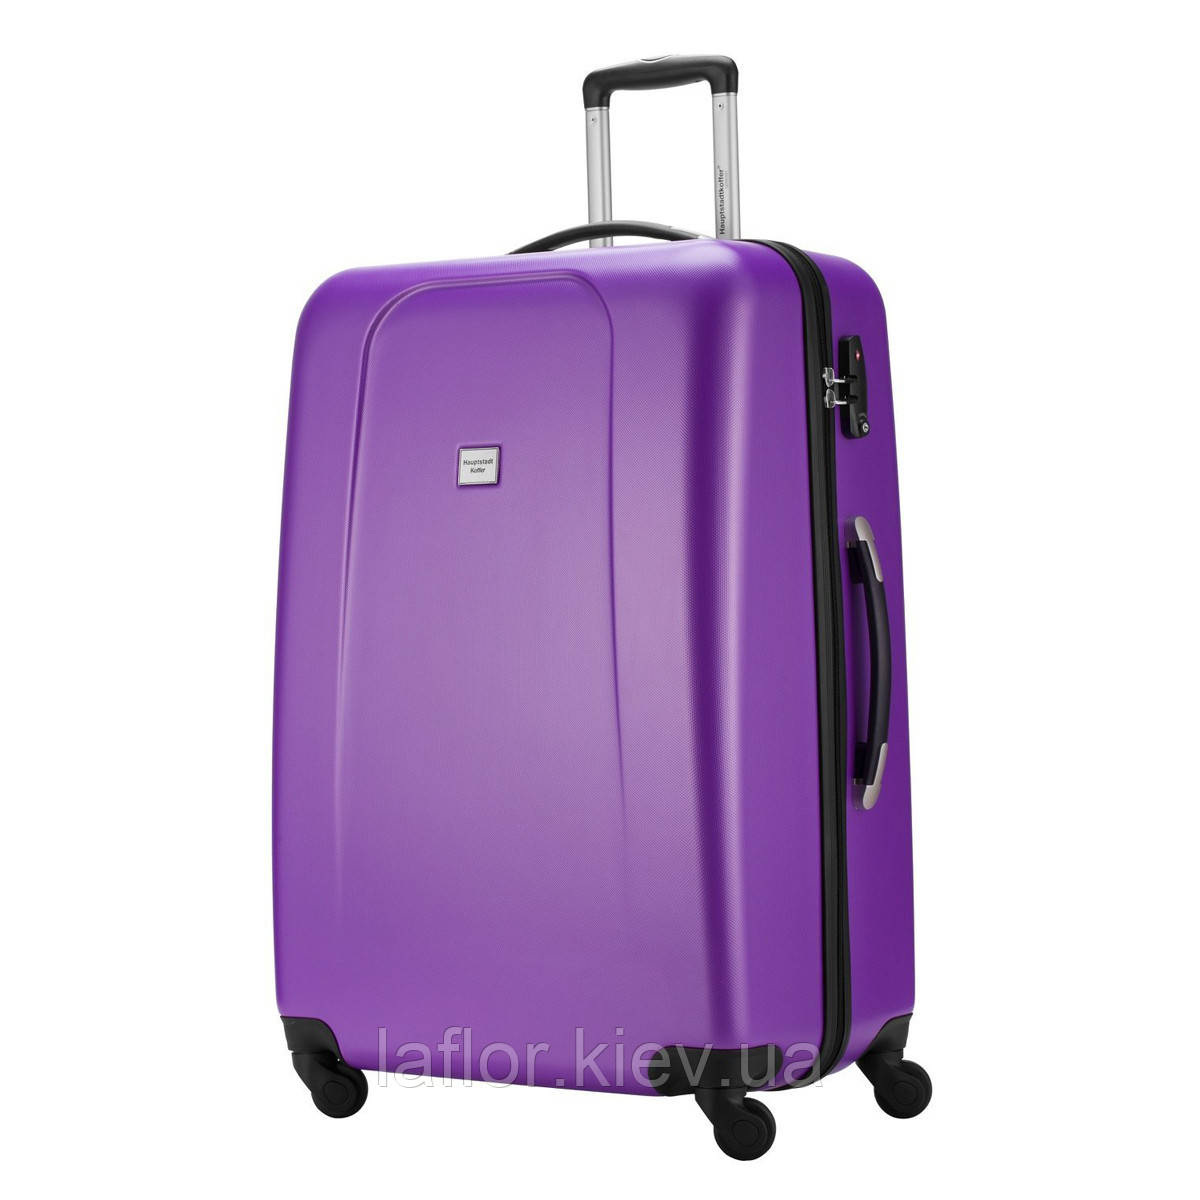 Великі валізи Hauptstadtkoffer maxi Wedding фіолетовий